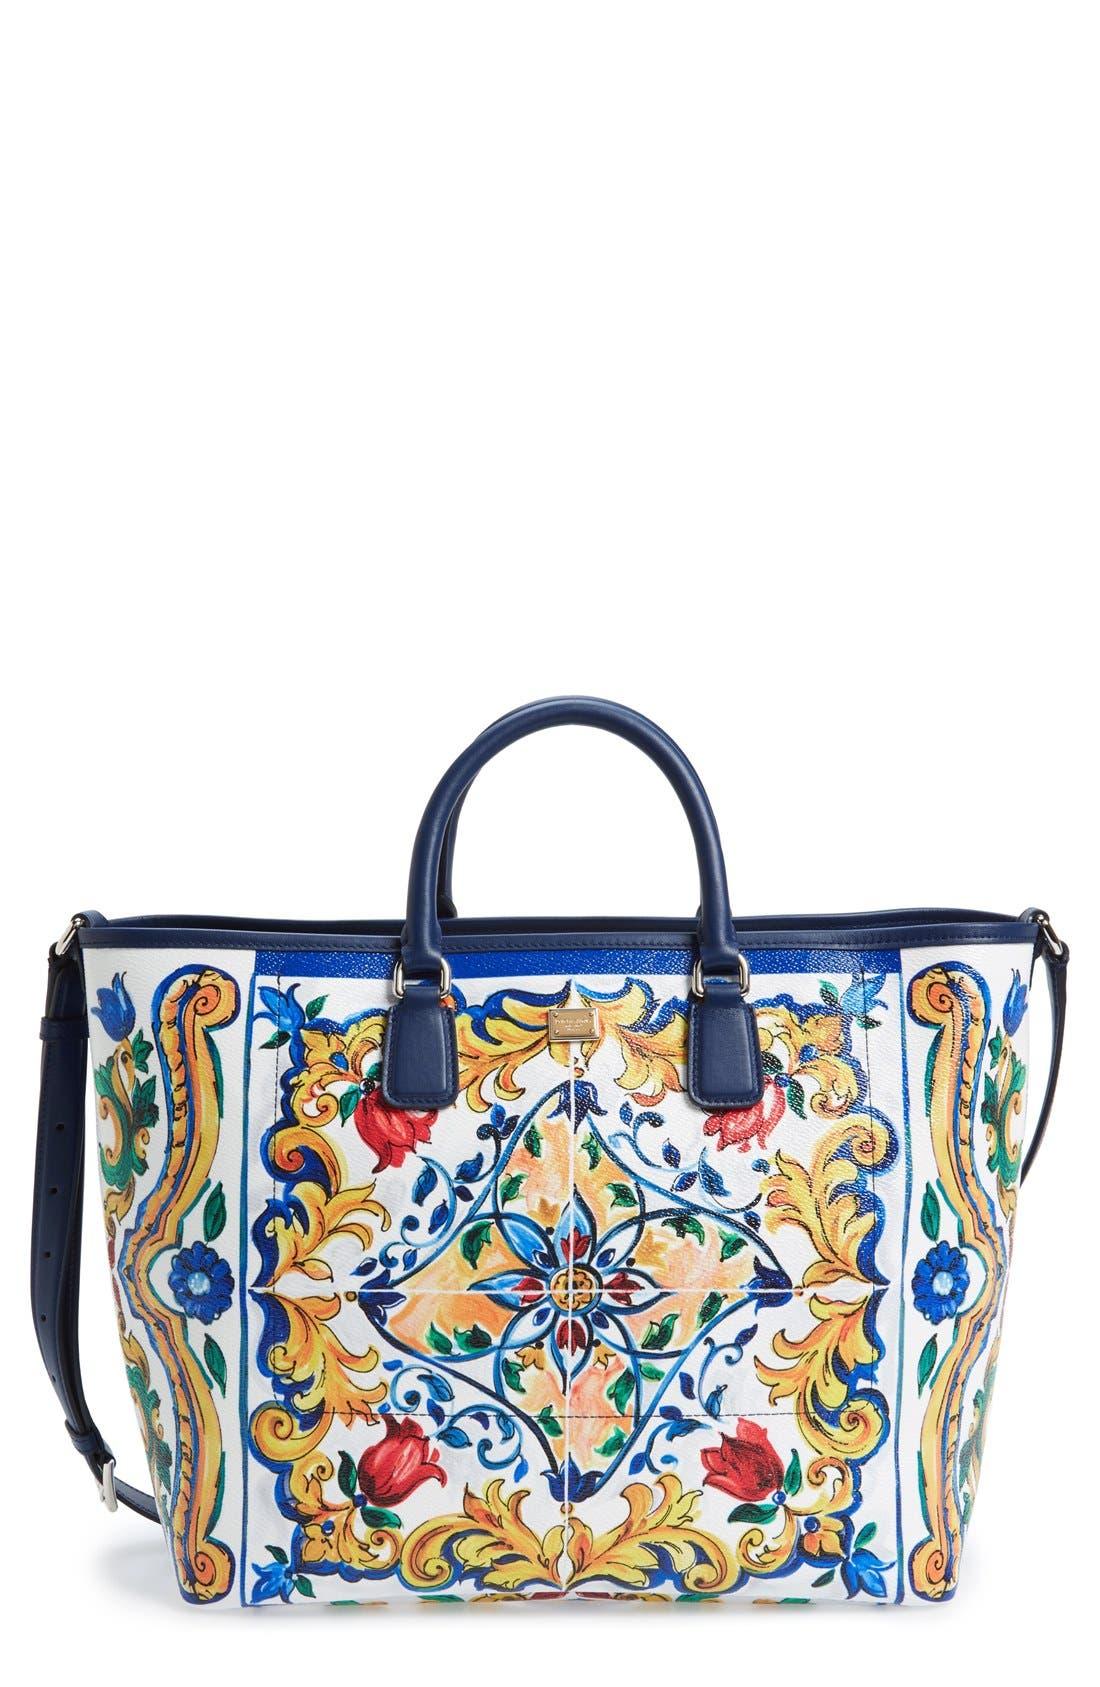 Alternate Image 1 Selected - Dolce&Gabbana 'Lara' Mallorca Print Painted Shopper